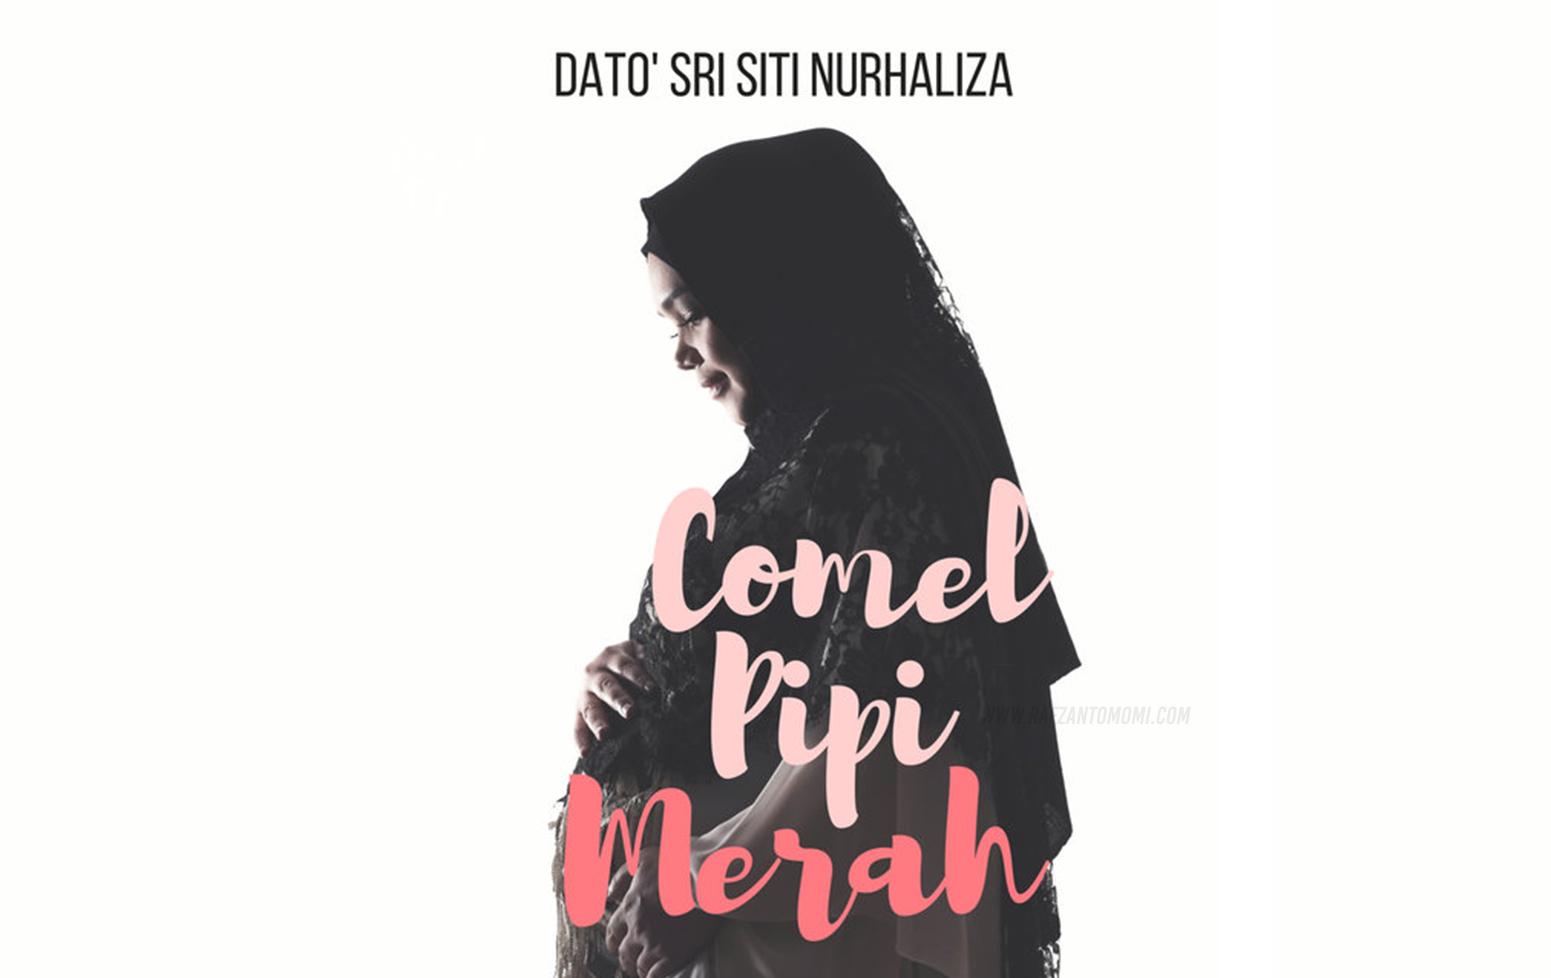 Lirik Lagu Comel Pipi Merah - Dato' Sri Siti Nurhaliza